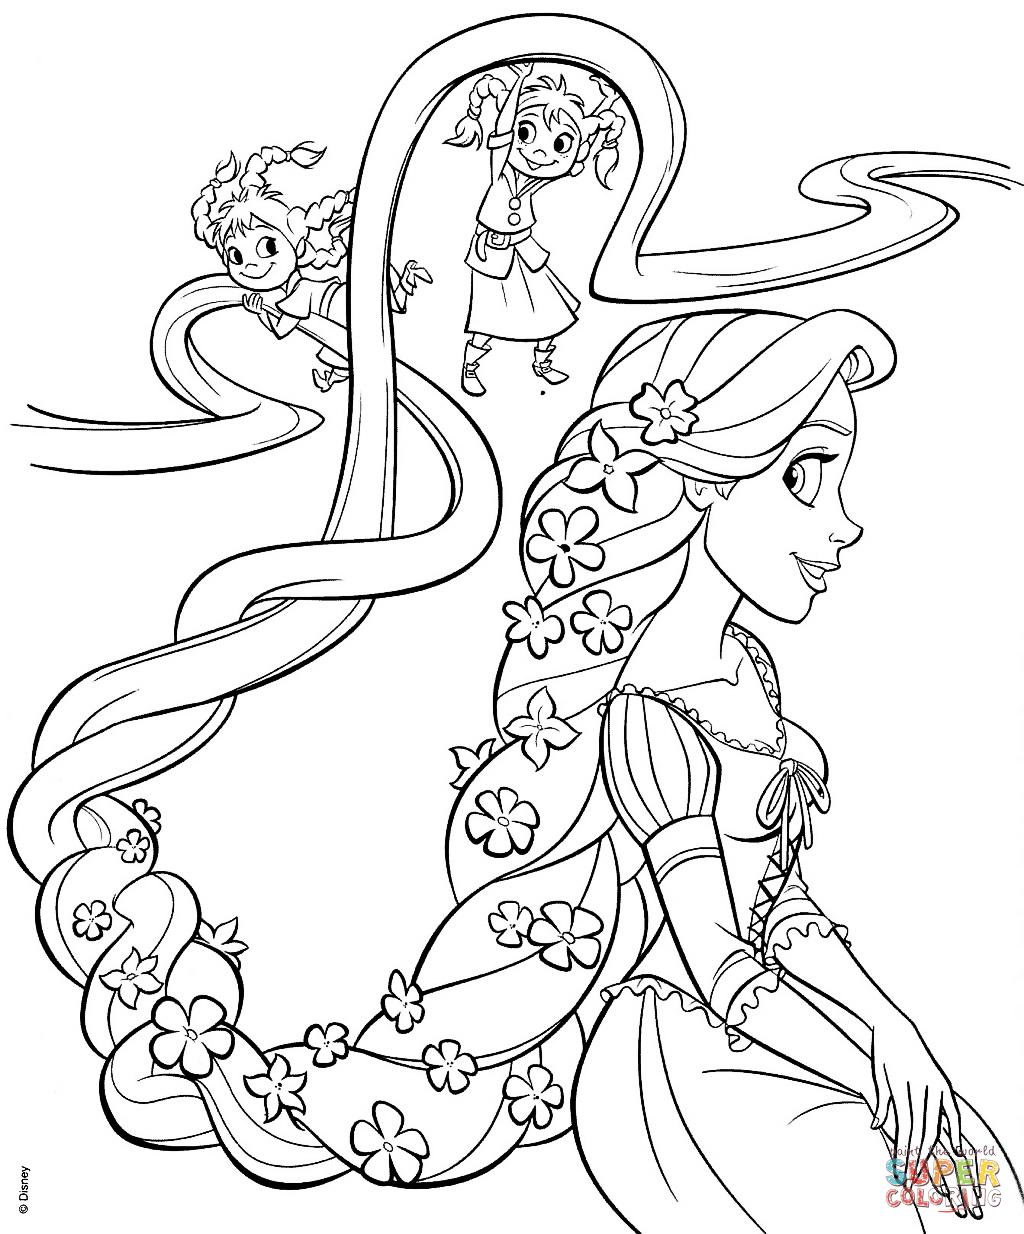 Rapunzel coloring #11, Download drawings